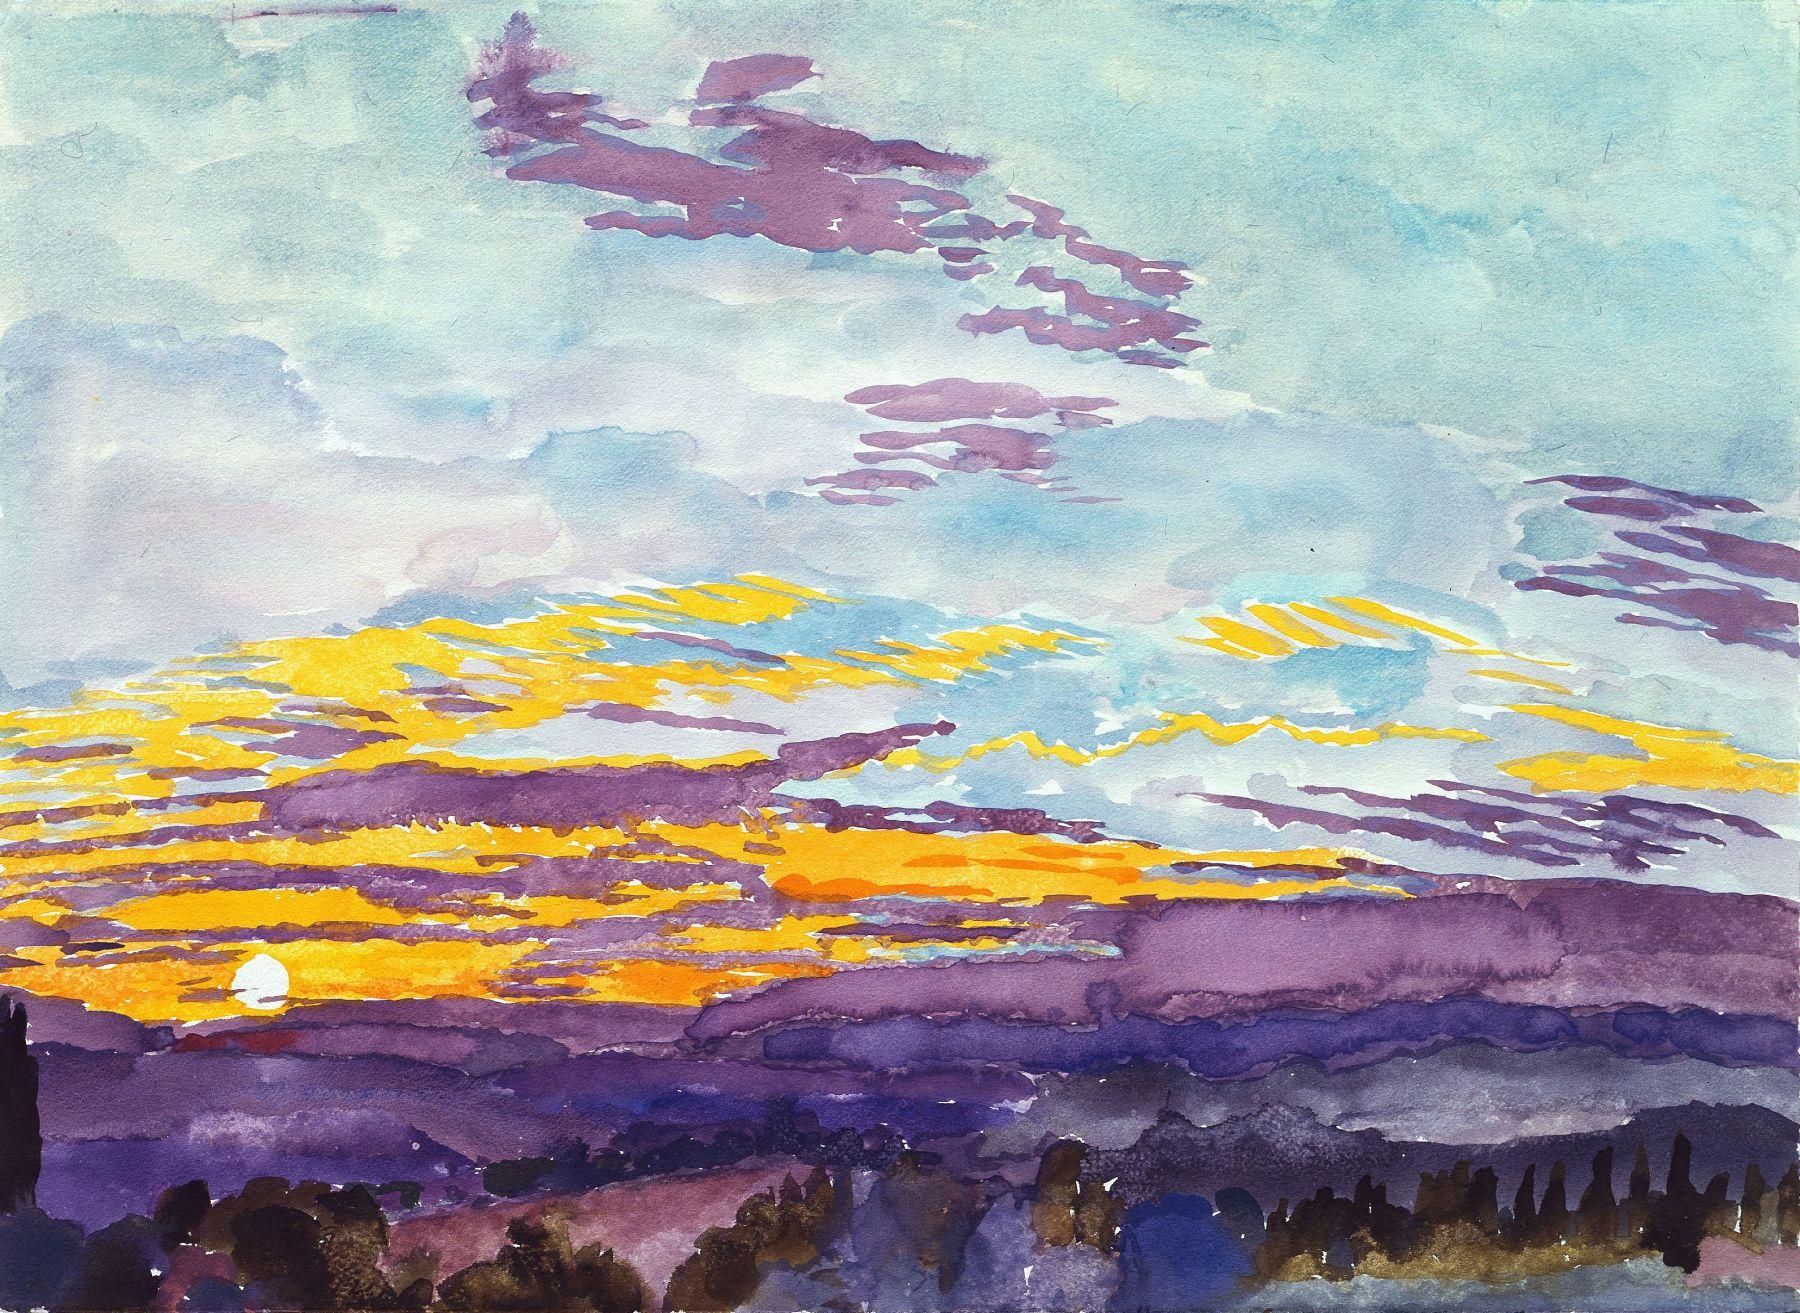 Graham Nickson, Sarageto XXVIII, 2006    Watercolor on paper 22 x 30 inches